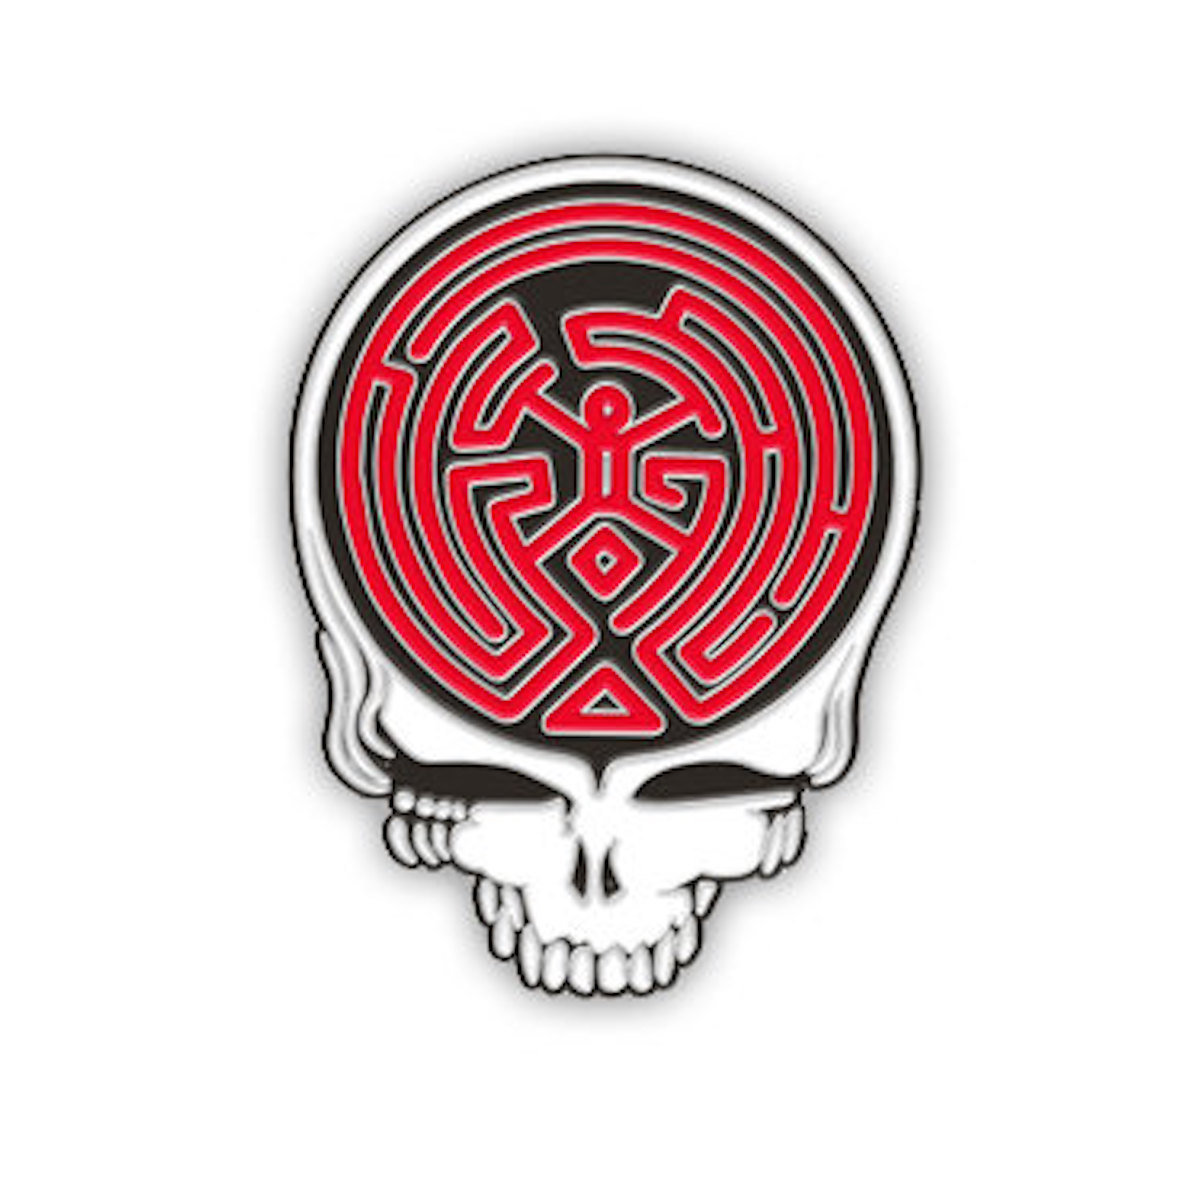 Grateful Dead Stealy Die Cut Vinyl Sticker Steal Your Face